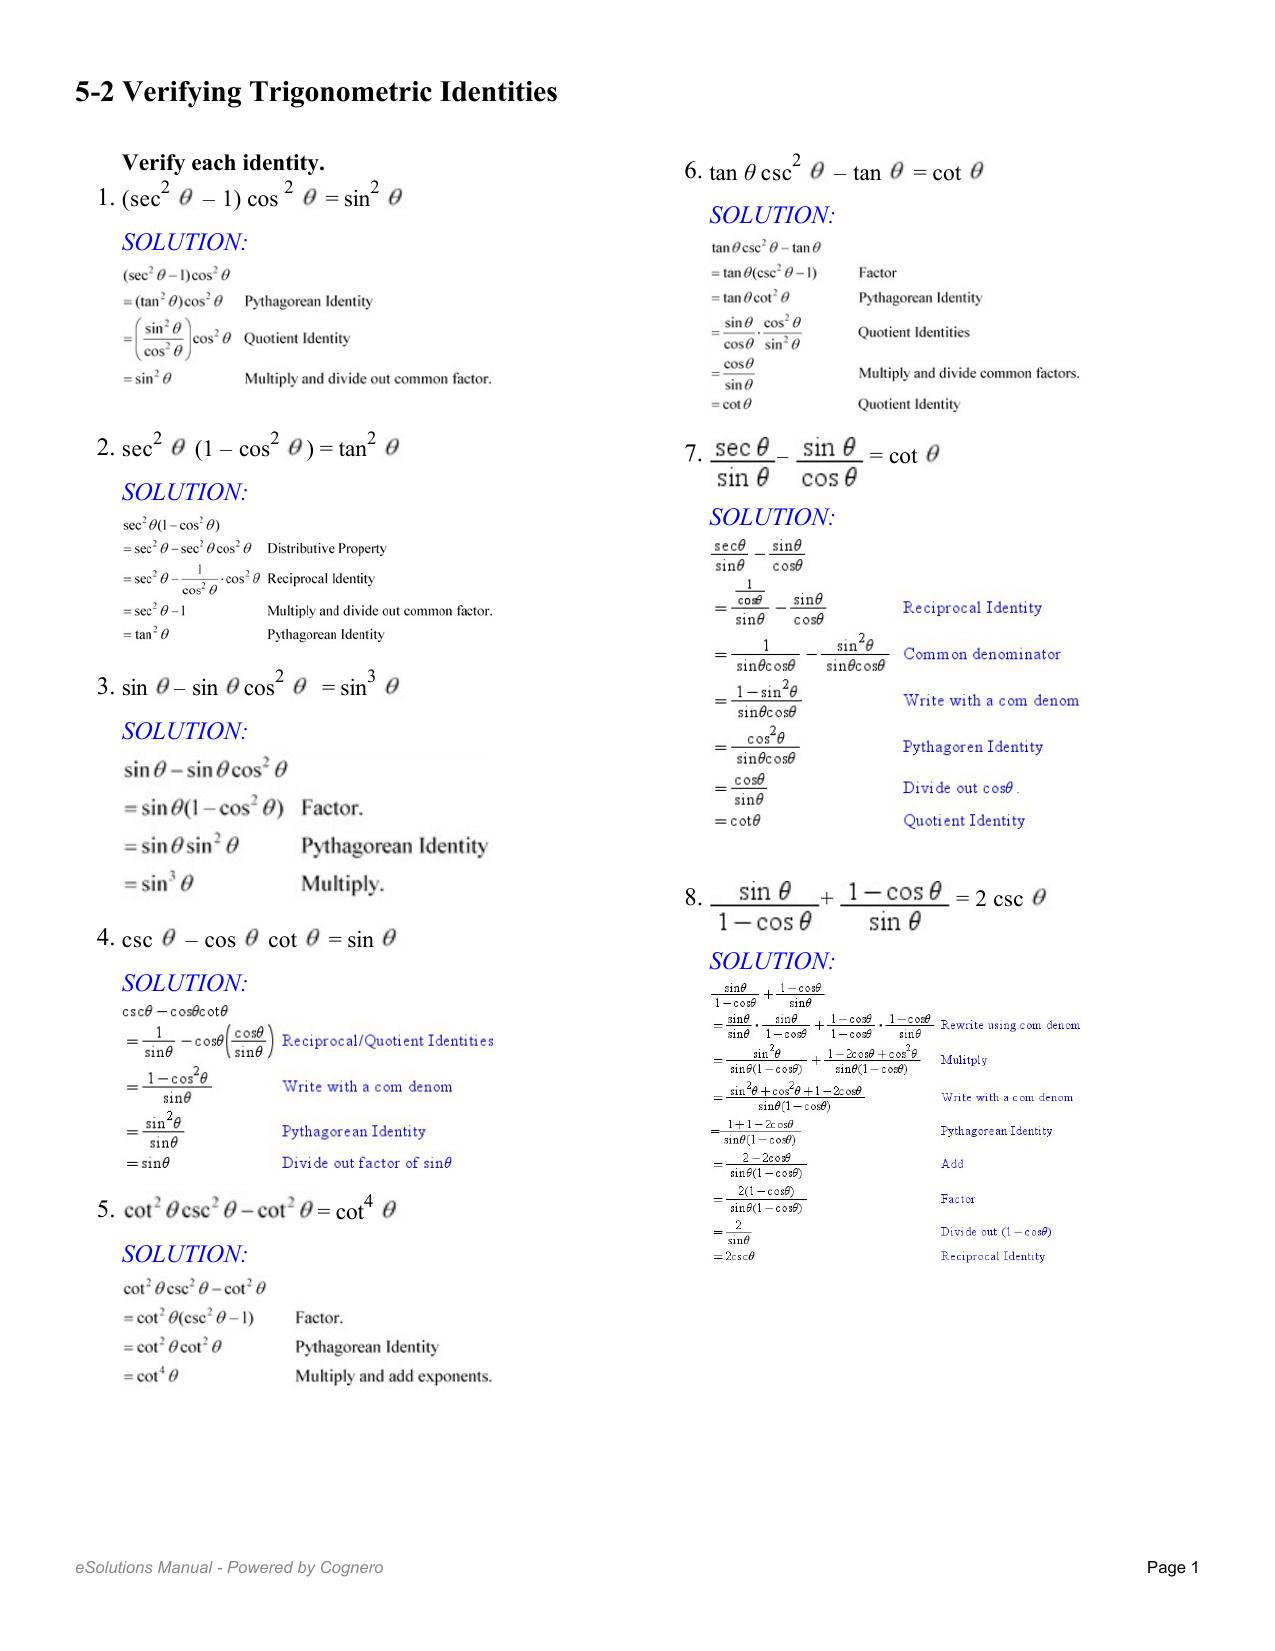 52 Verifying Trigonometric Identities Pertaining To Trig Identities Worksheet With Answers